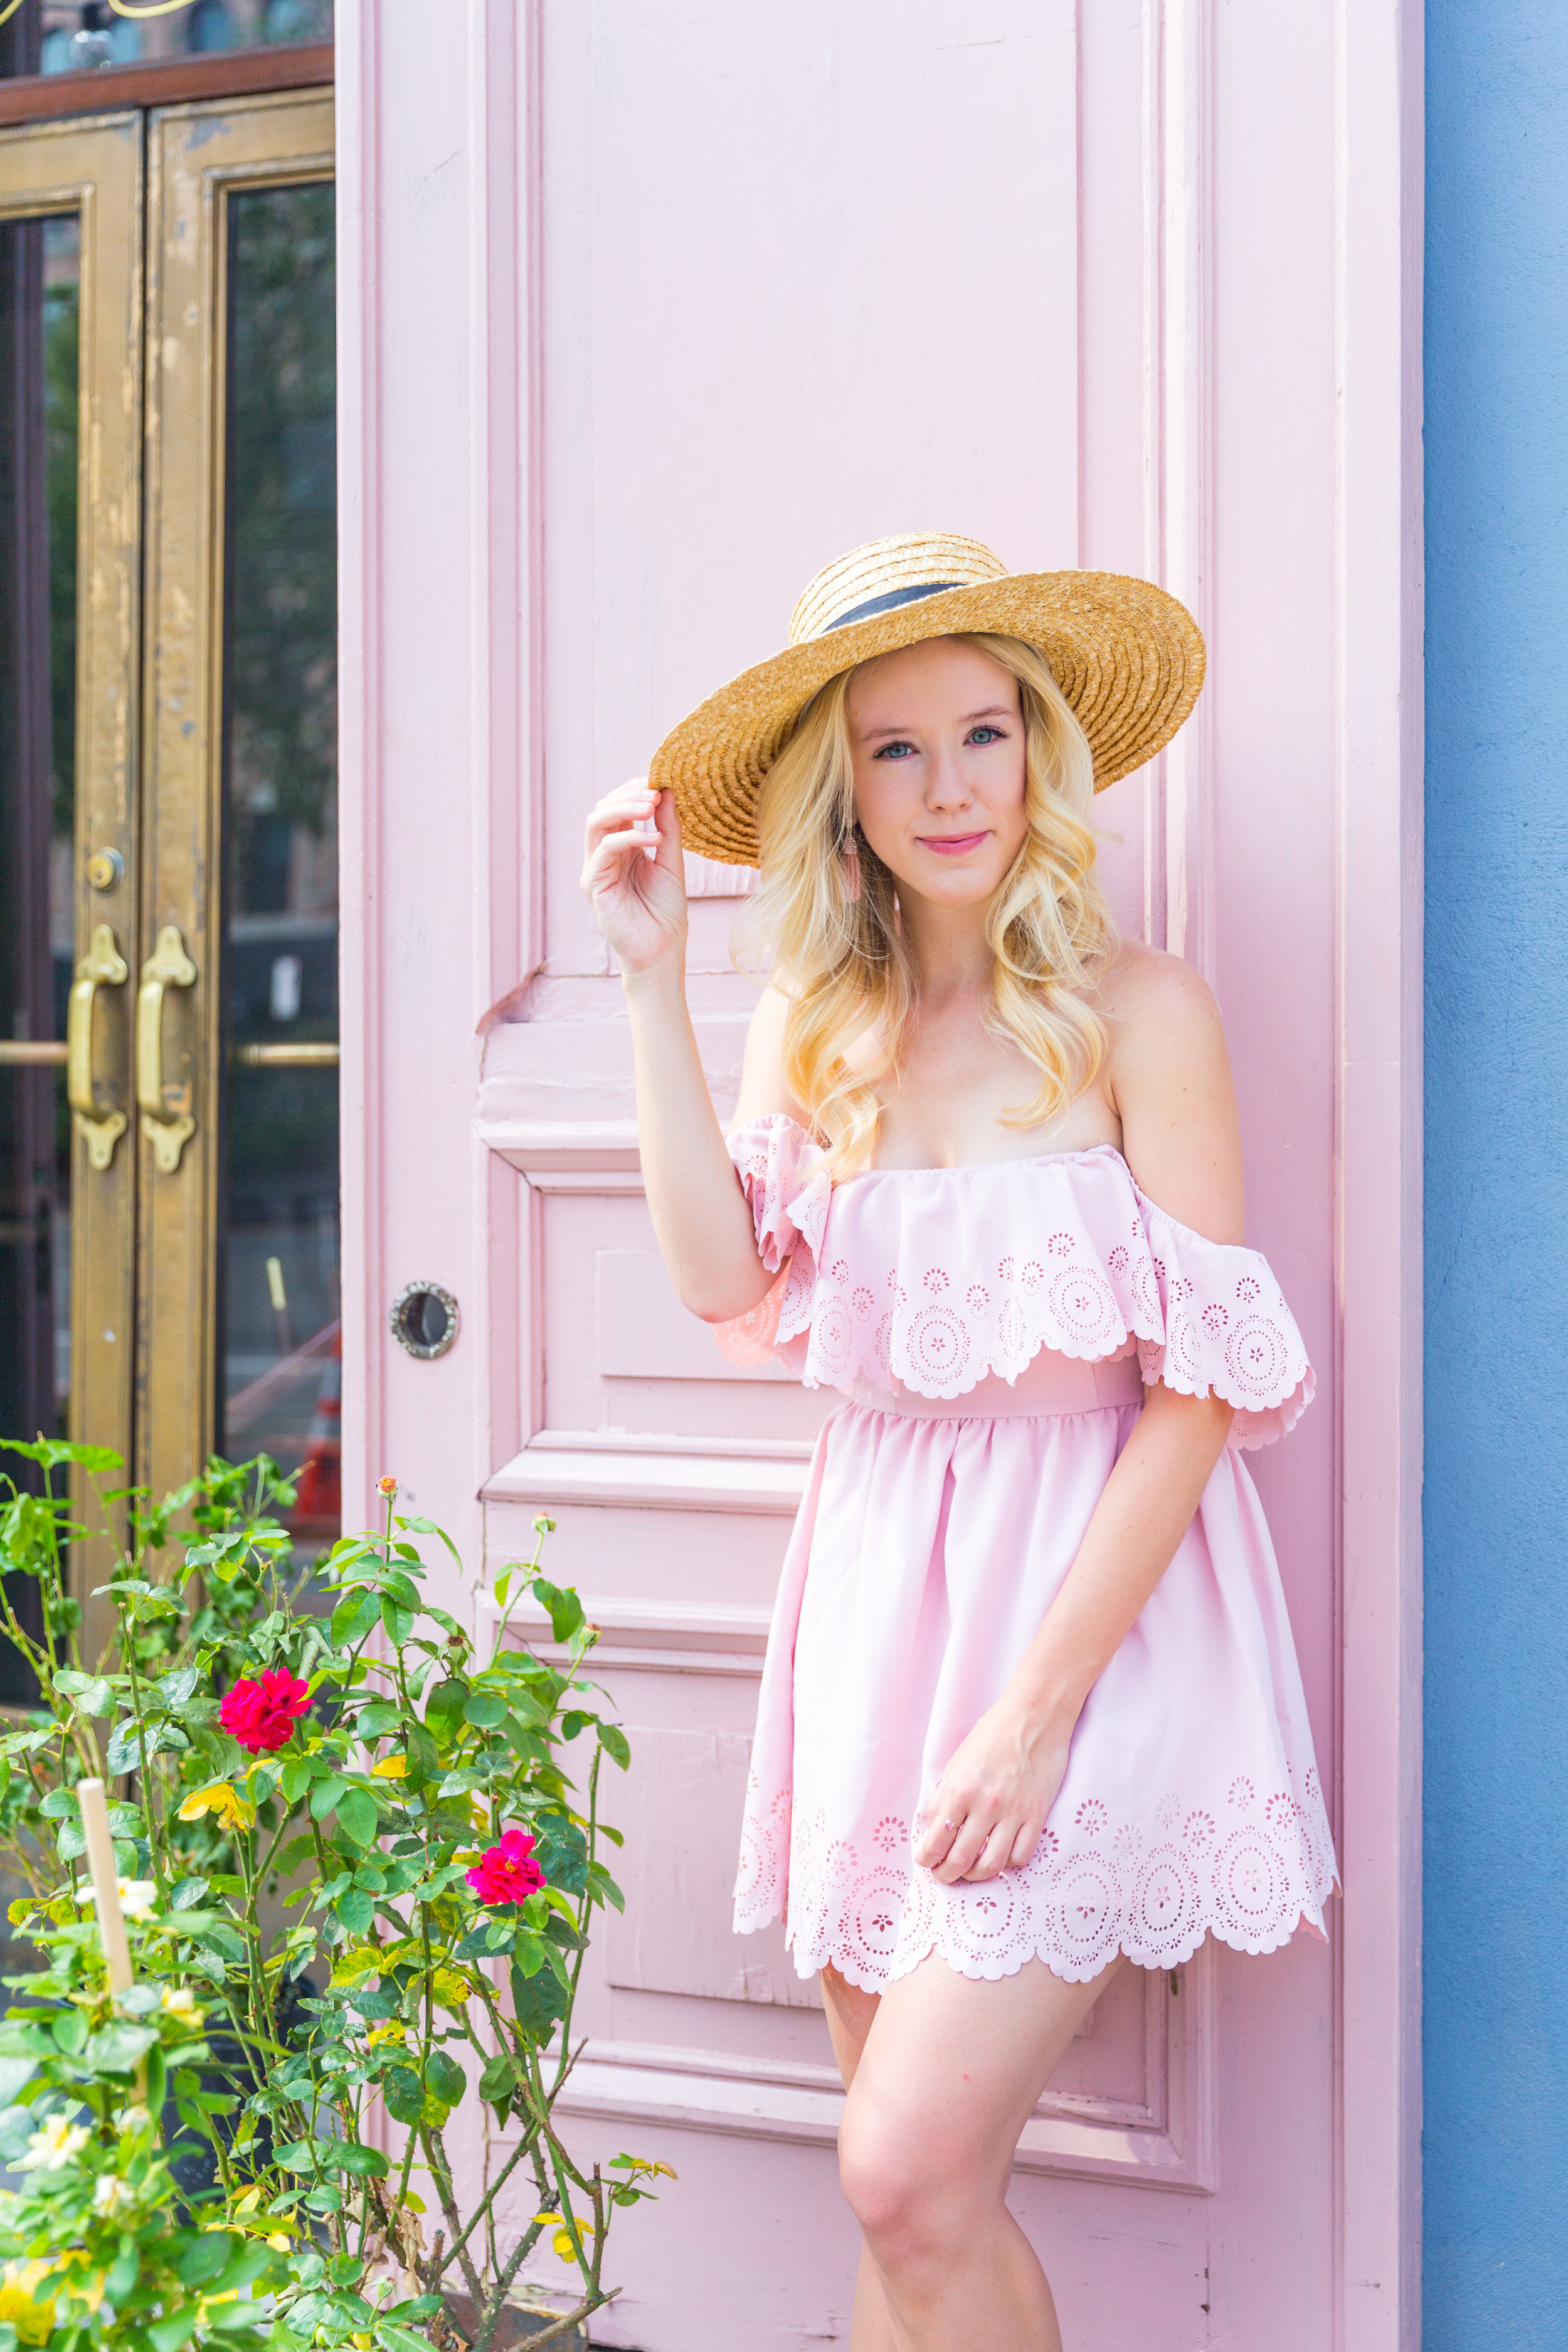 Summer Fashion NYC Pink Off Shoulder Lace Dress.jpg